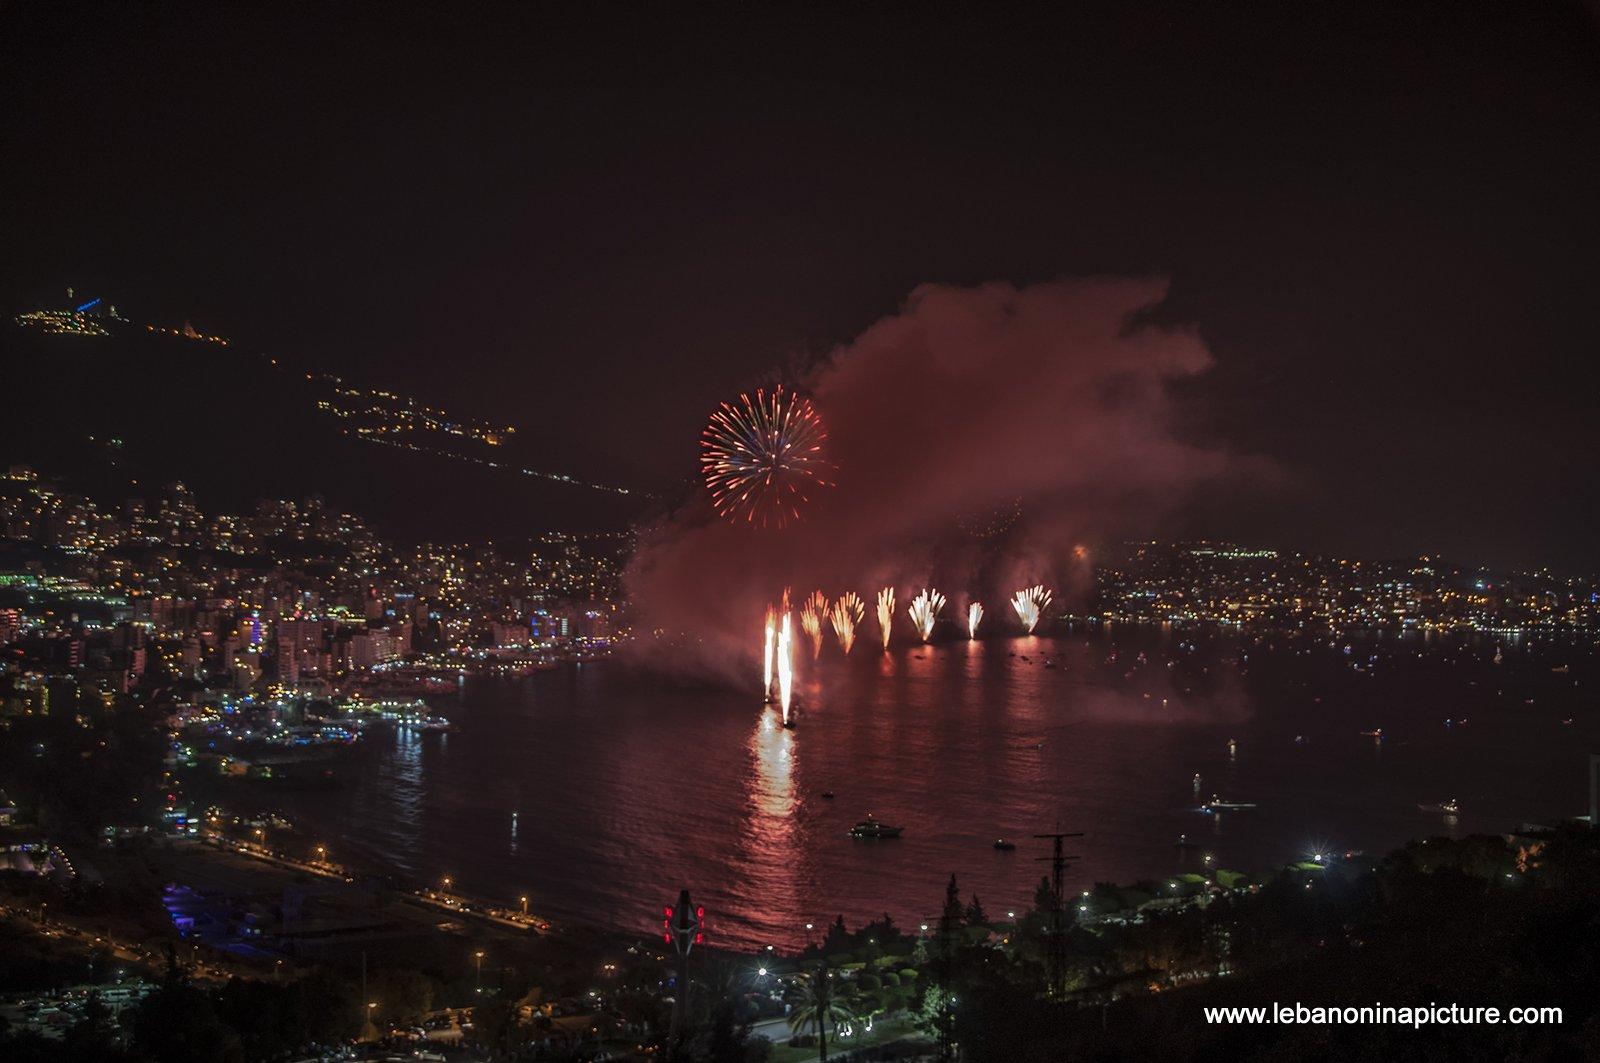 Jounieh Fireworks 2017 - More Smoke